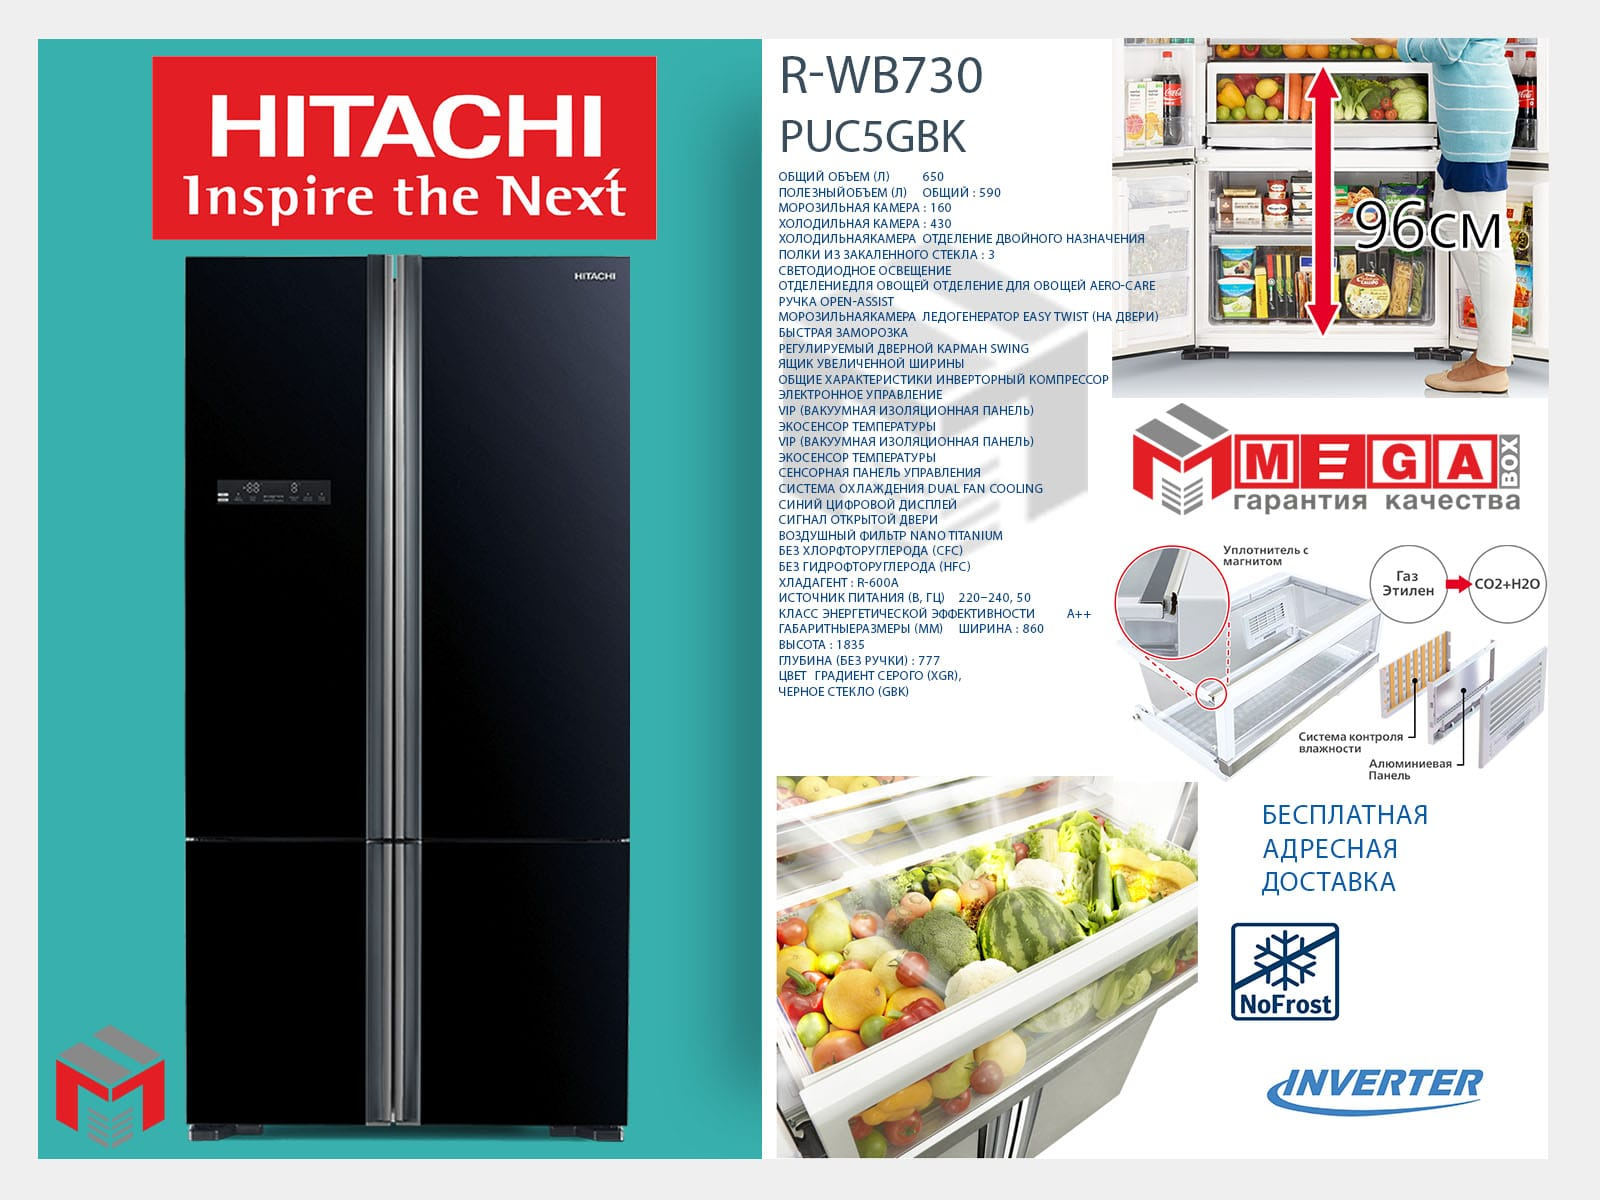 r-WB730PUC5GBK-min Холодильник Hitachi R-WB730PUC5GBK